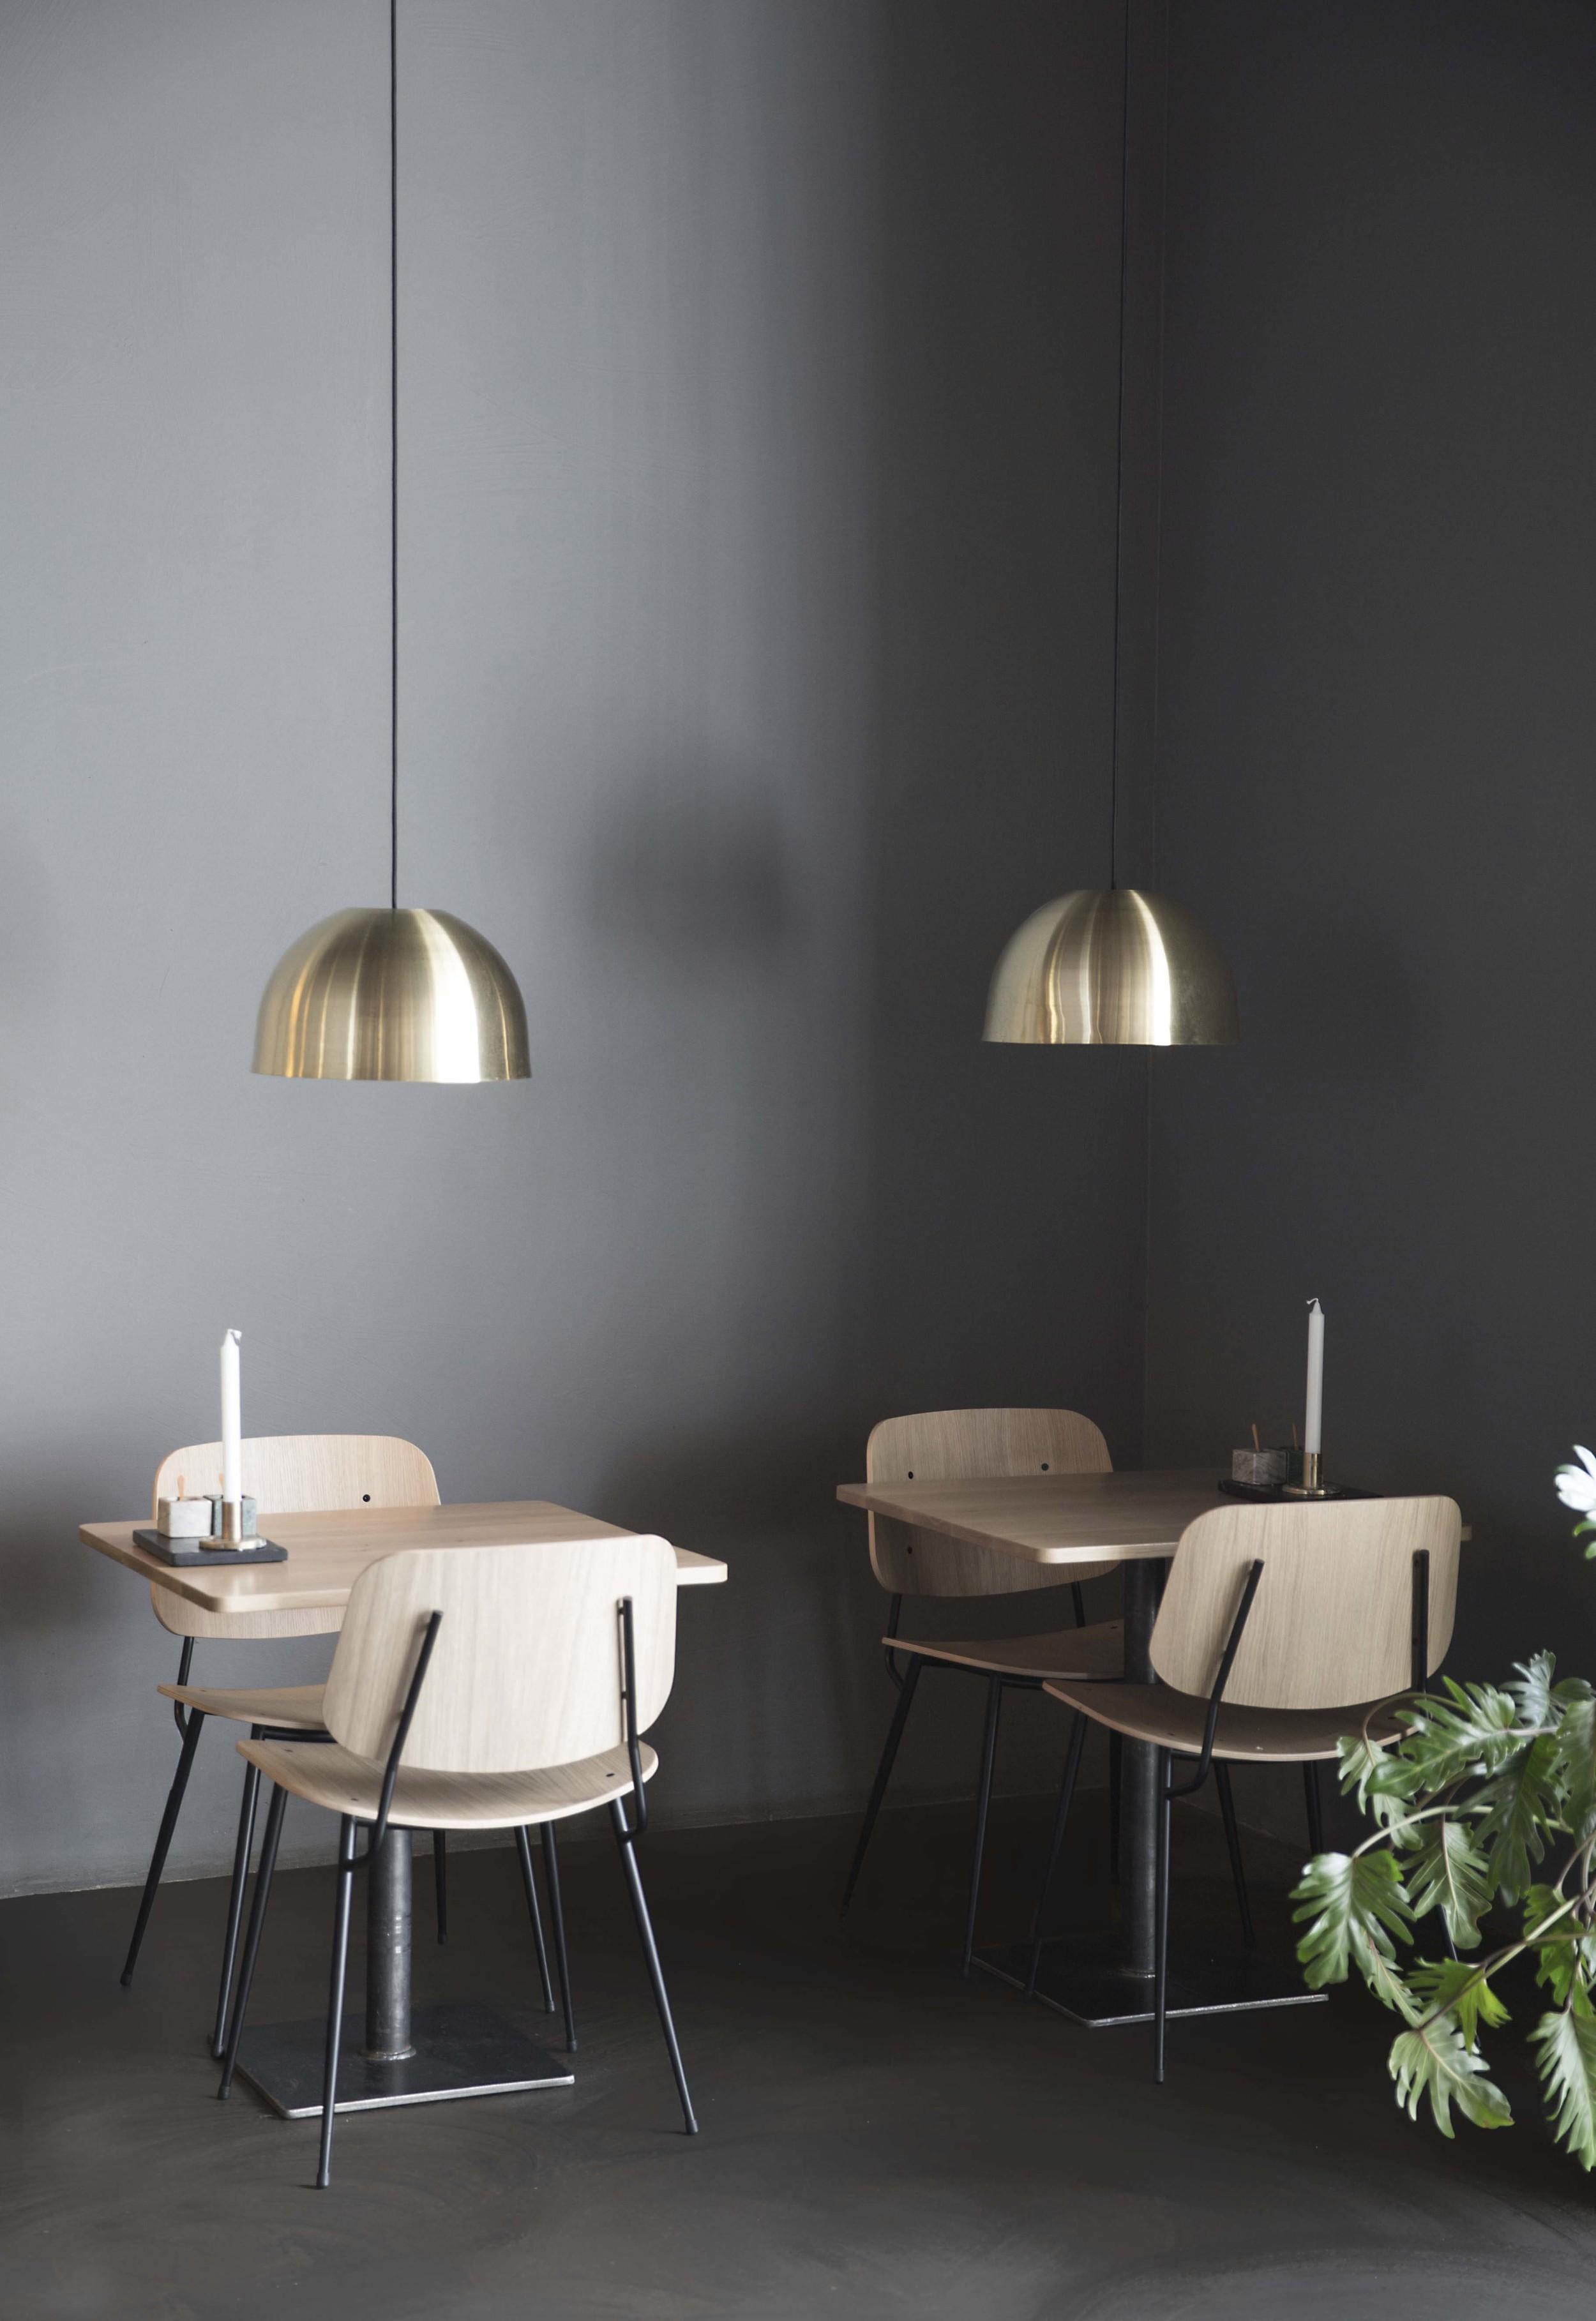 chair design restaurant black lycra covers for sale palaeo johannes torpe interior and scnadinavian furniture in copenhagen designed by studios